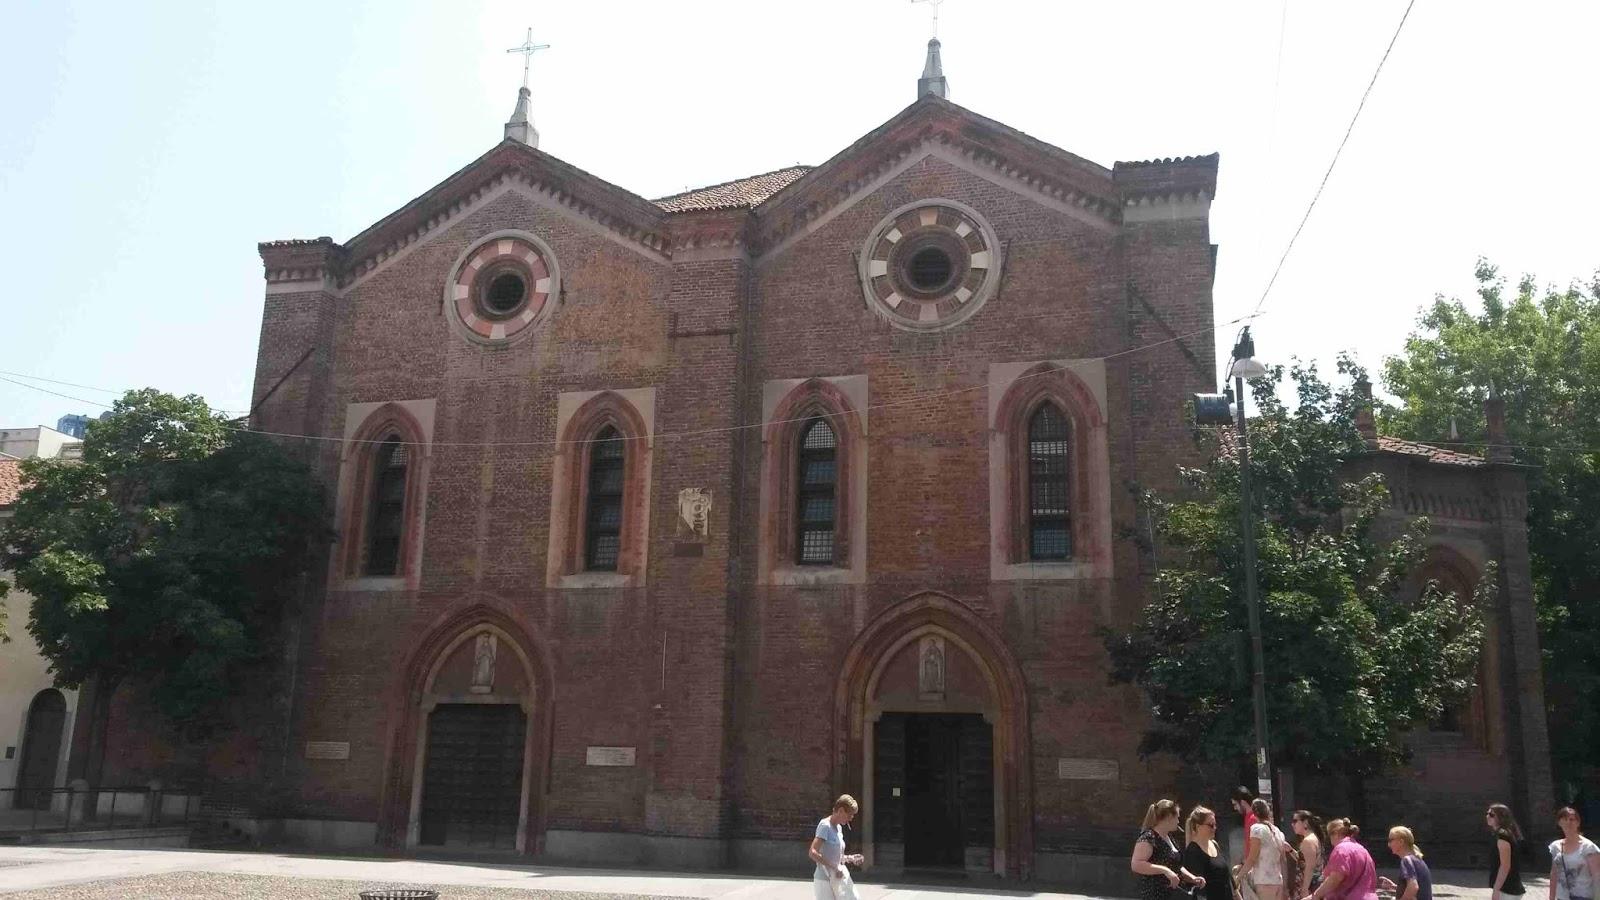 Olonaweb: ITINERARI MILANESI: PORTA GARIBALDI-QUARTIERE